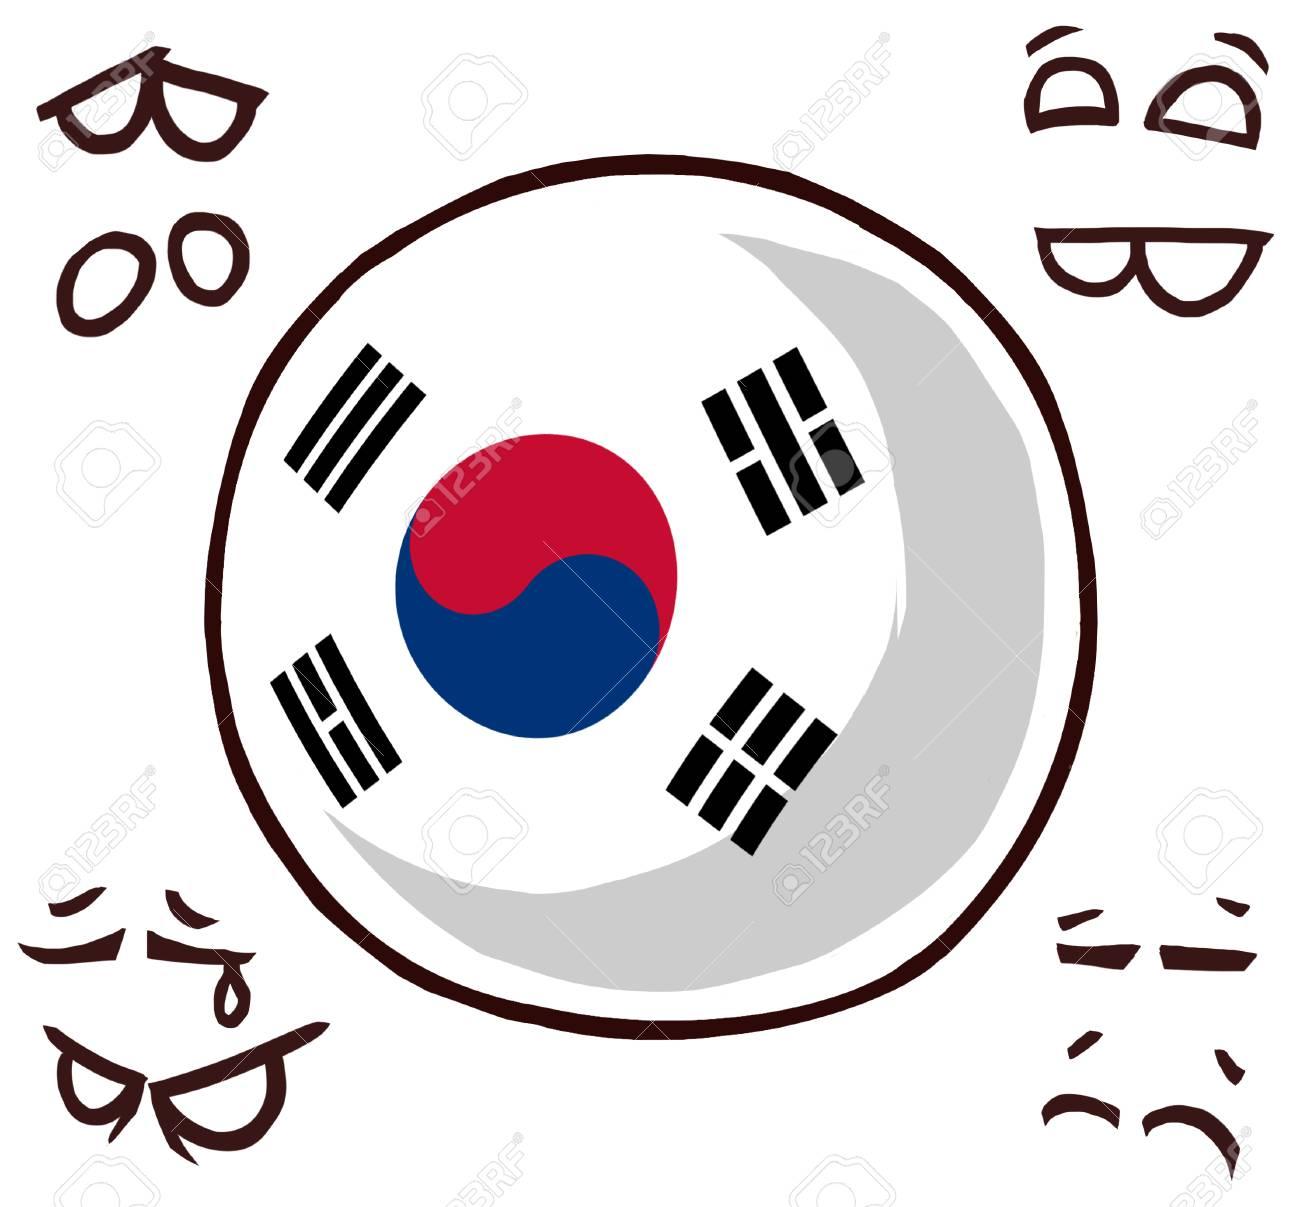 south korea country ball - 110841535